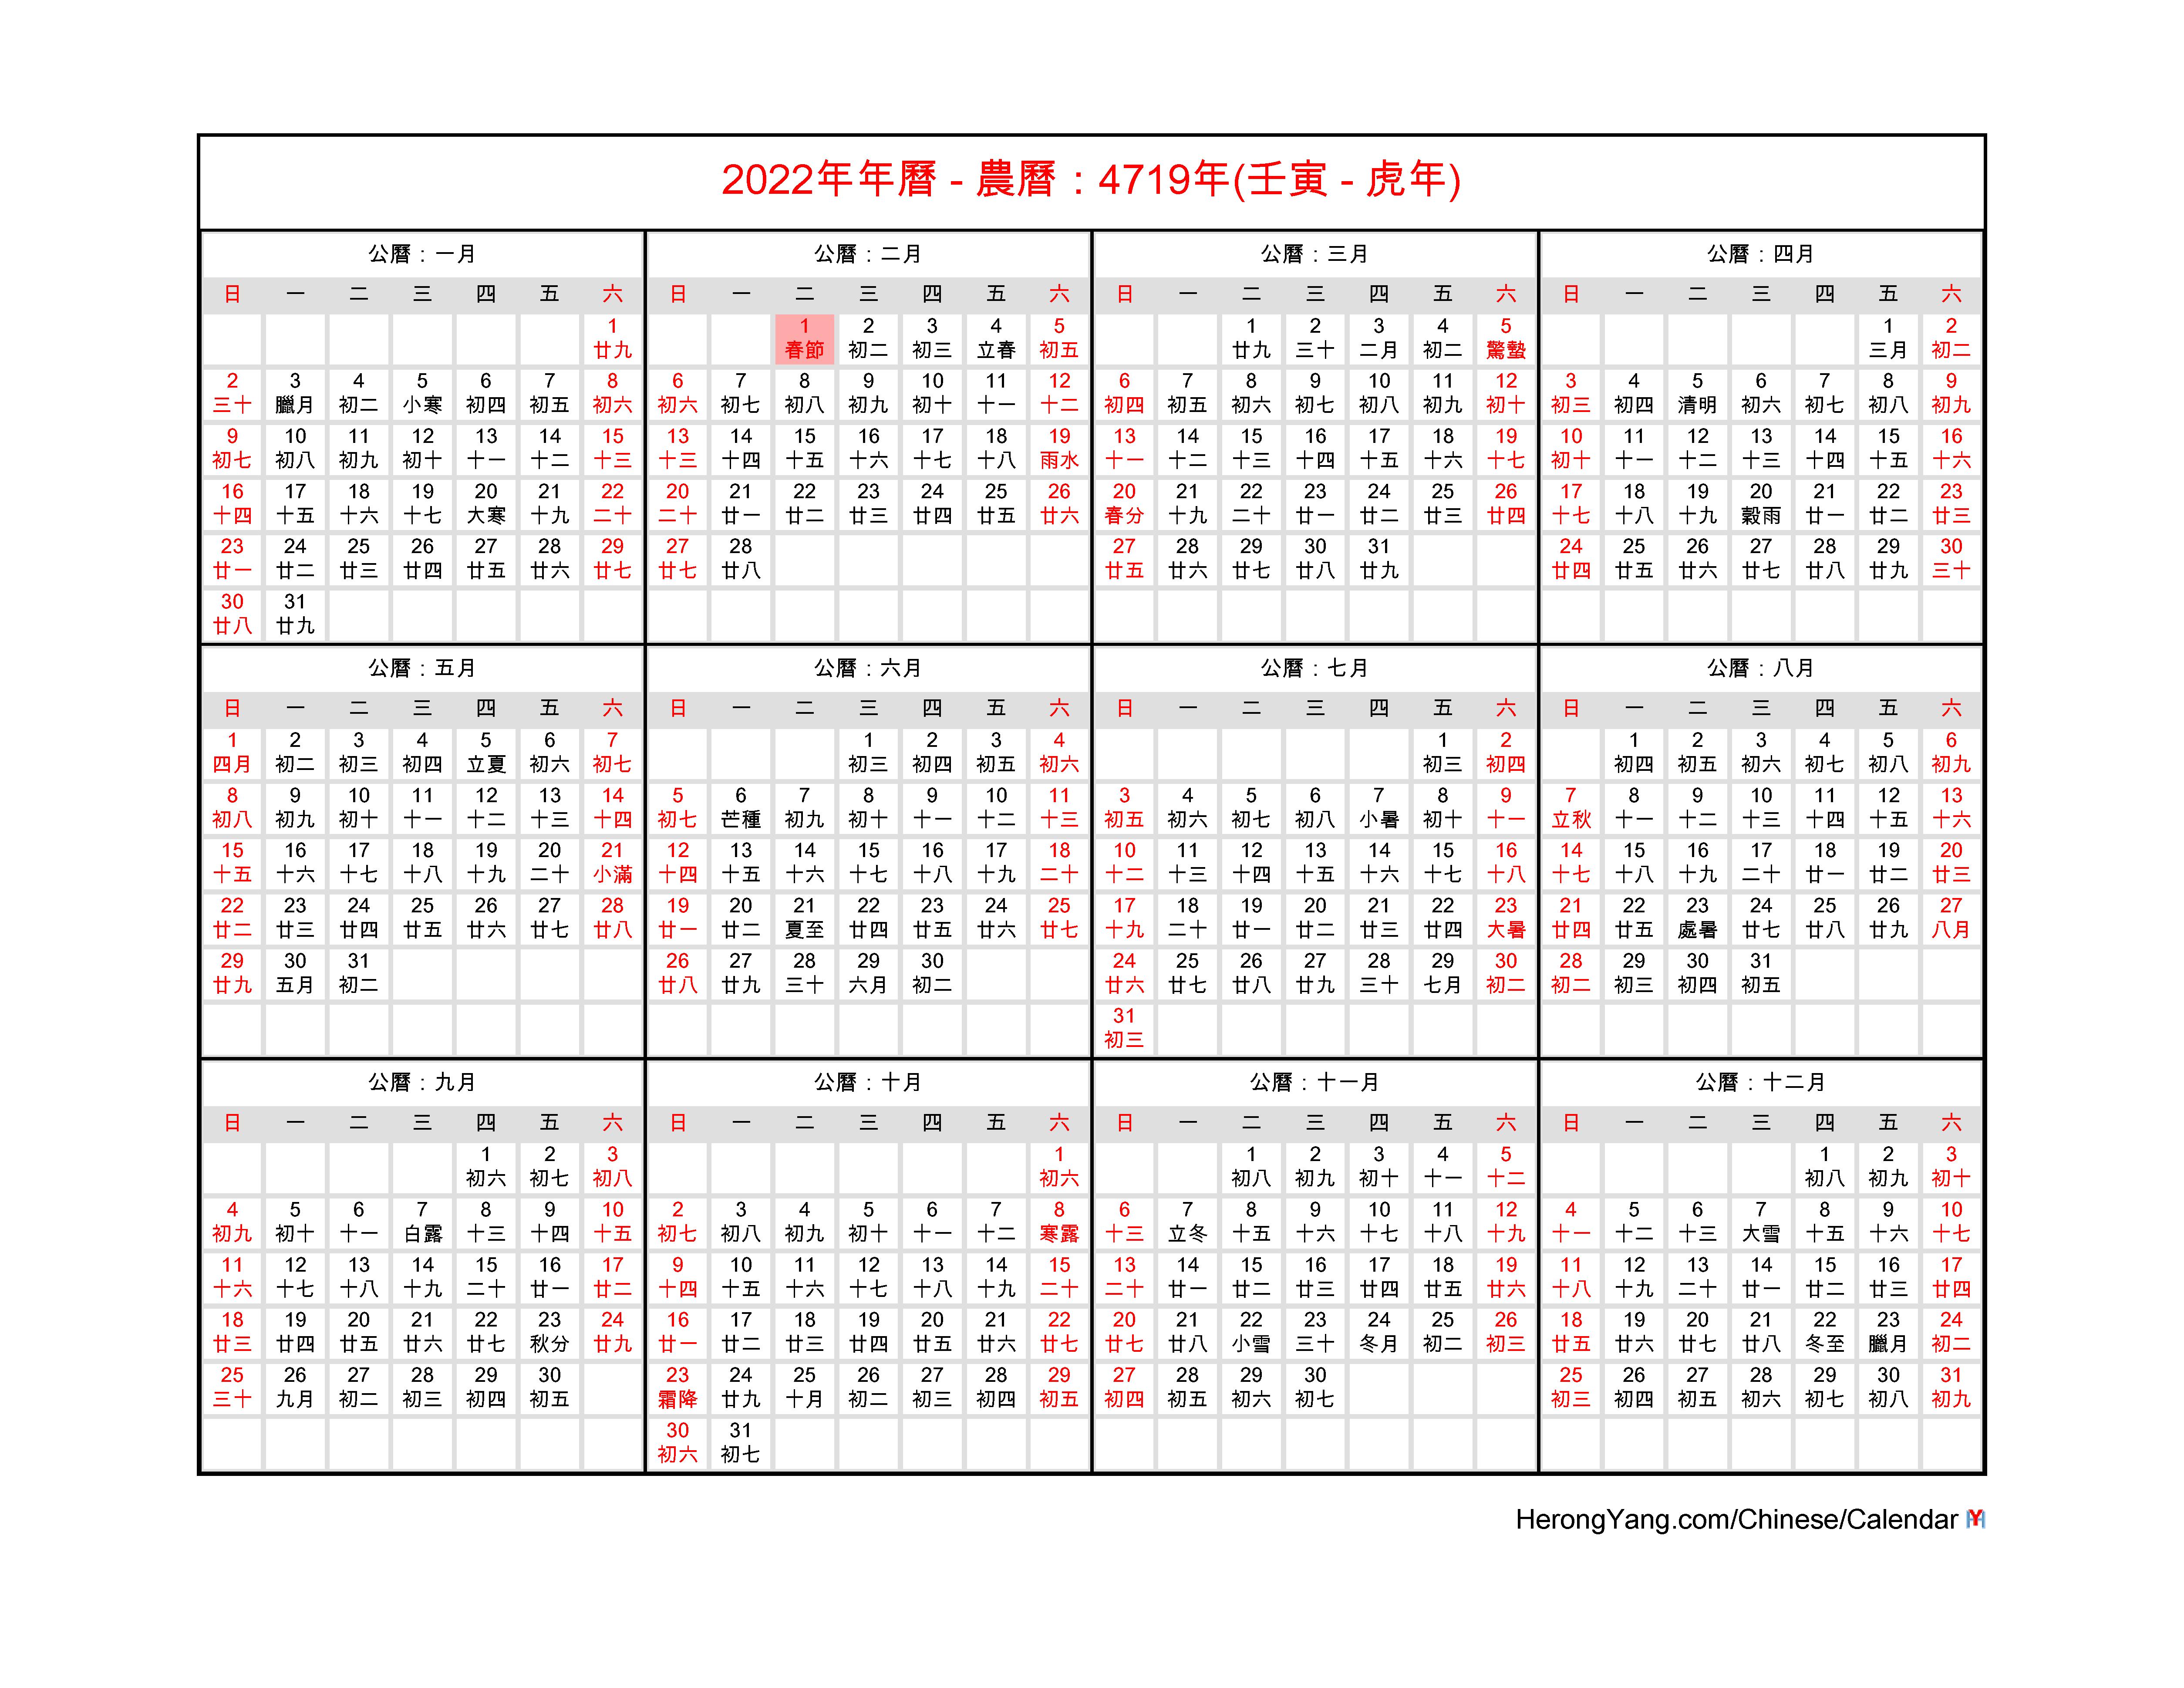 Lunar Calendar 2022.Free Chinese Calendar 2022 Year Of The Tiger